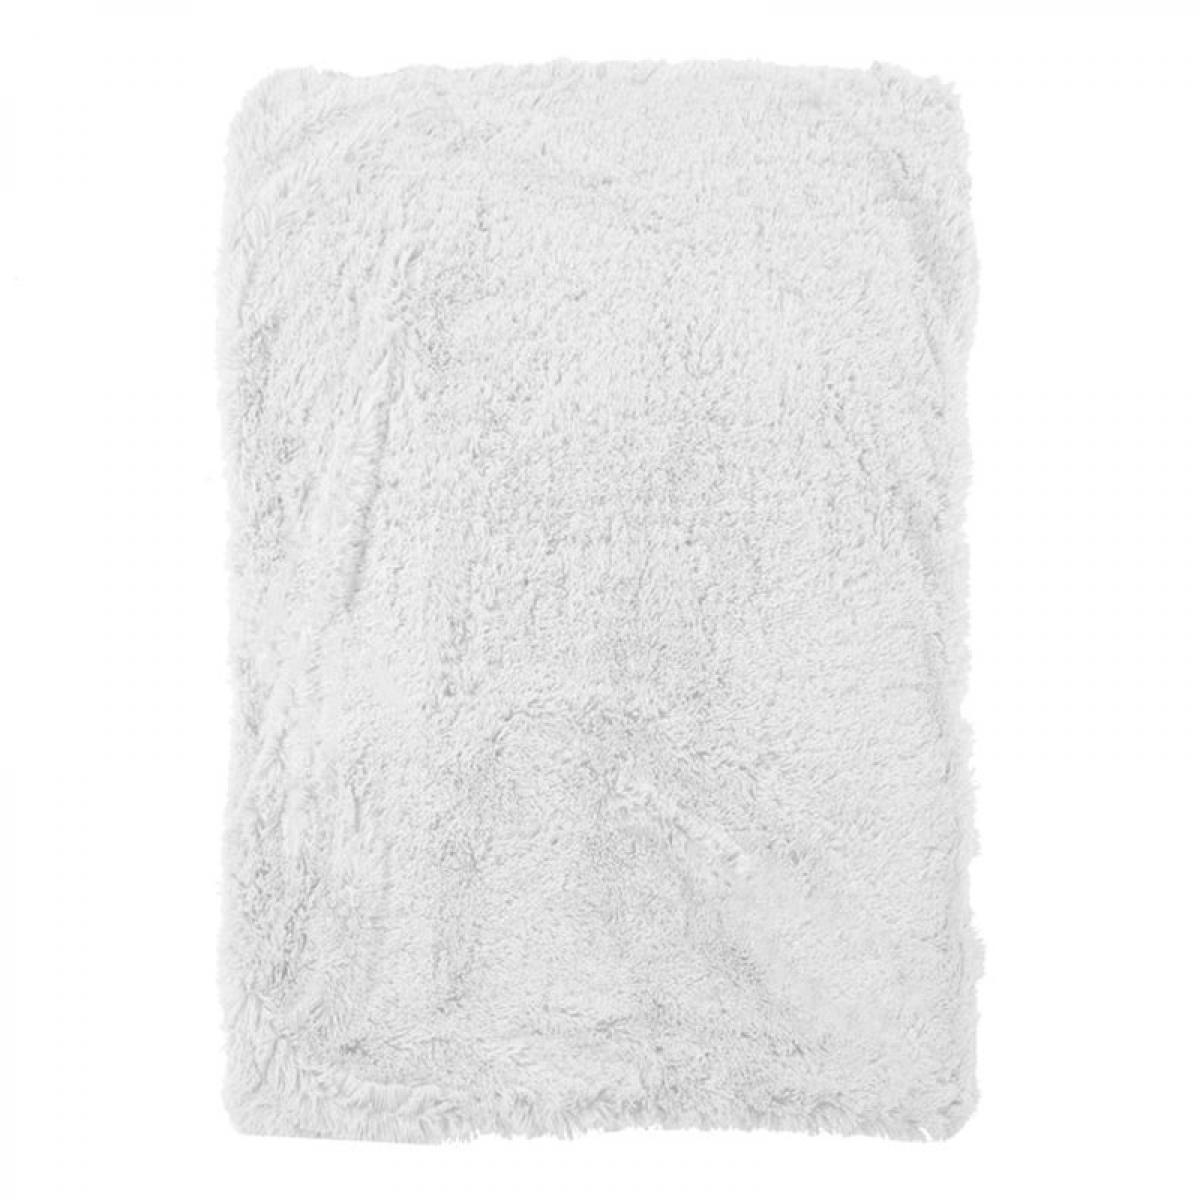 Mon Beau Tapis NEO YOGA - Plaid à poils longs extra-doux blanc 120x150